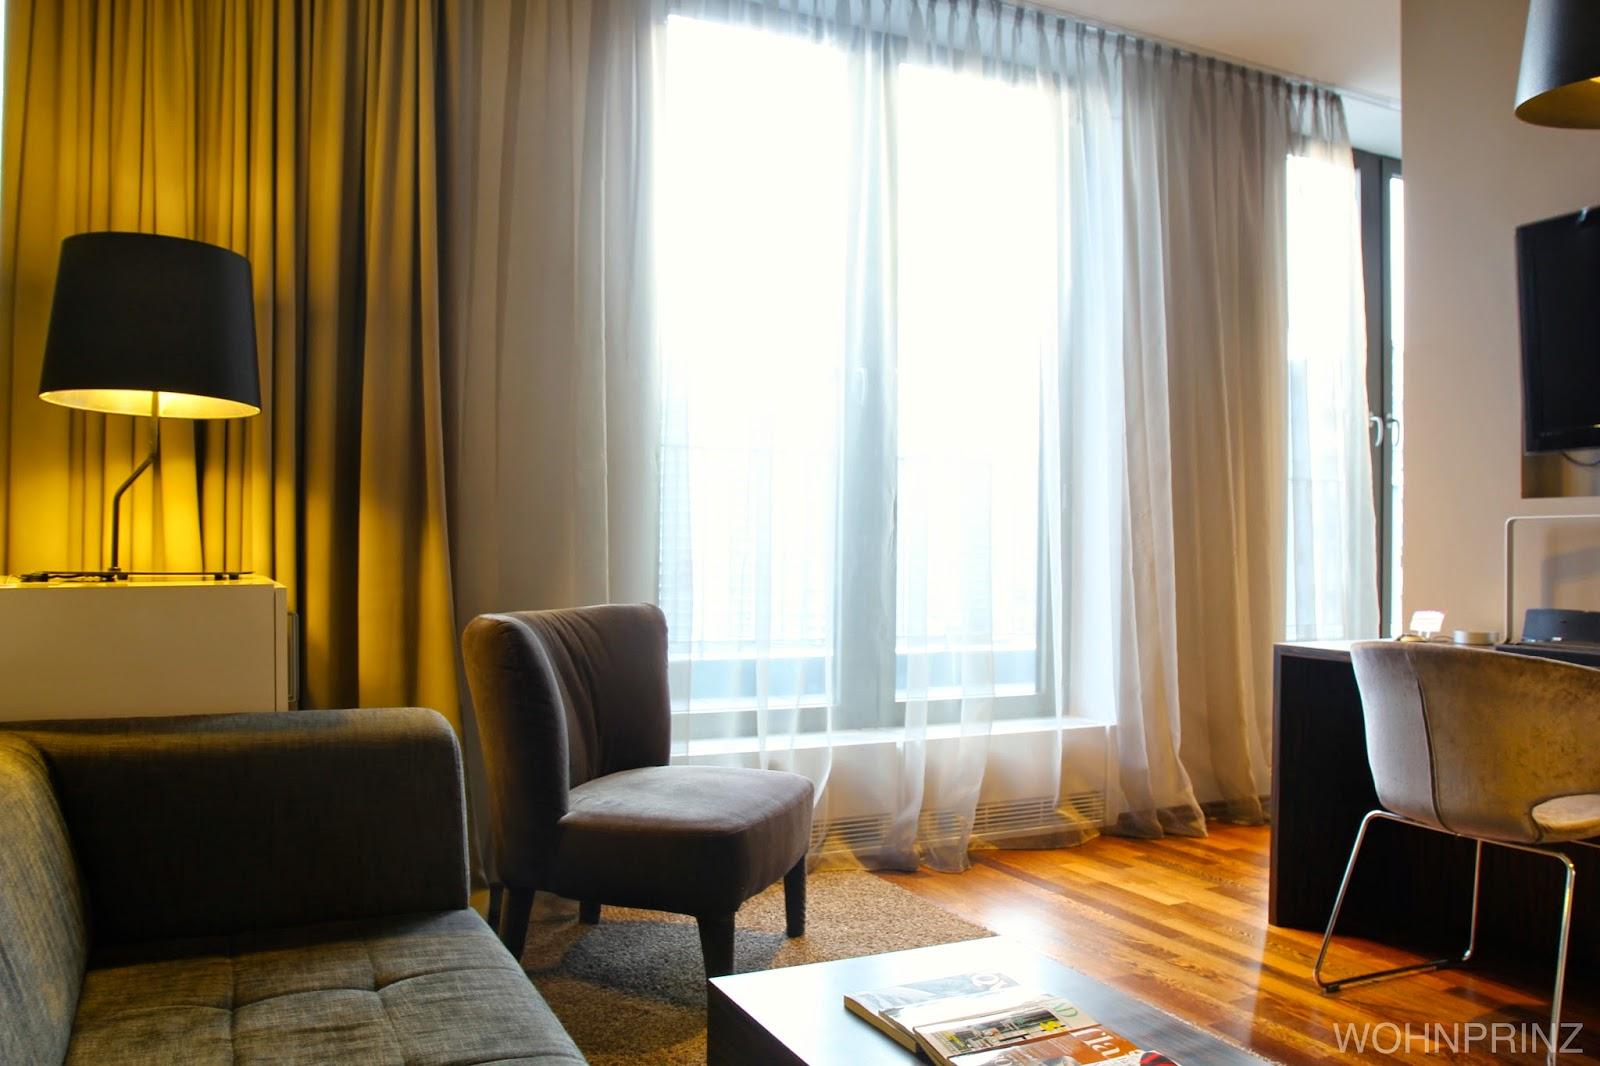 bastian der wohnprinz wohnblogger im videoformat cosmoperience cosmo hotel berlin. Black Bedroom Furniture Sets. Home Design Ideas